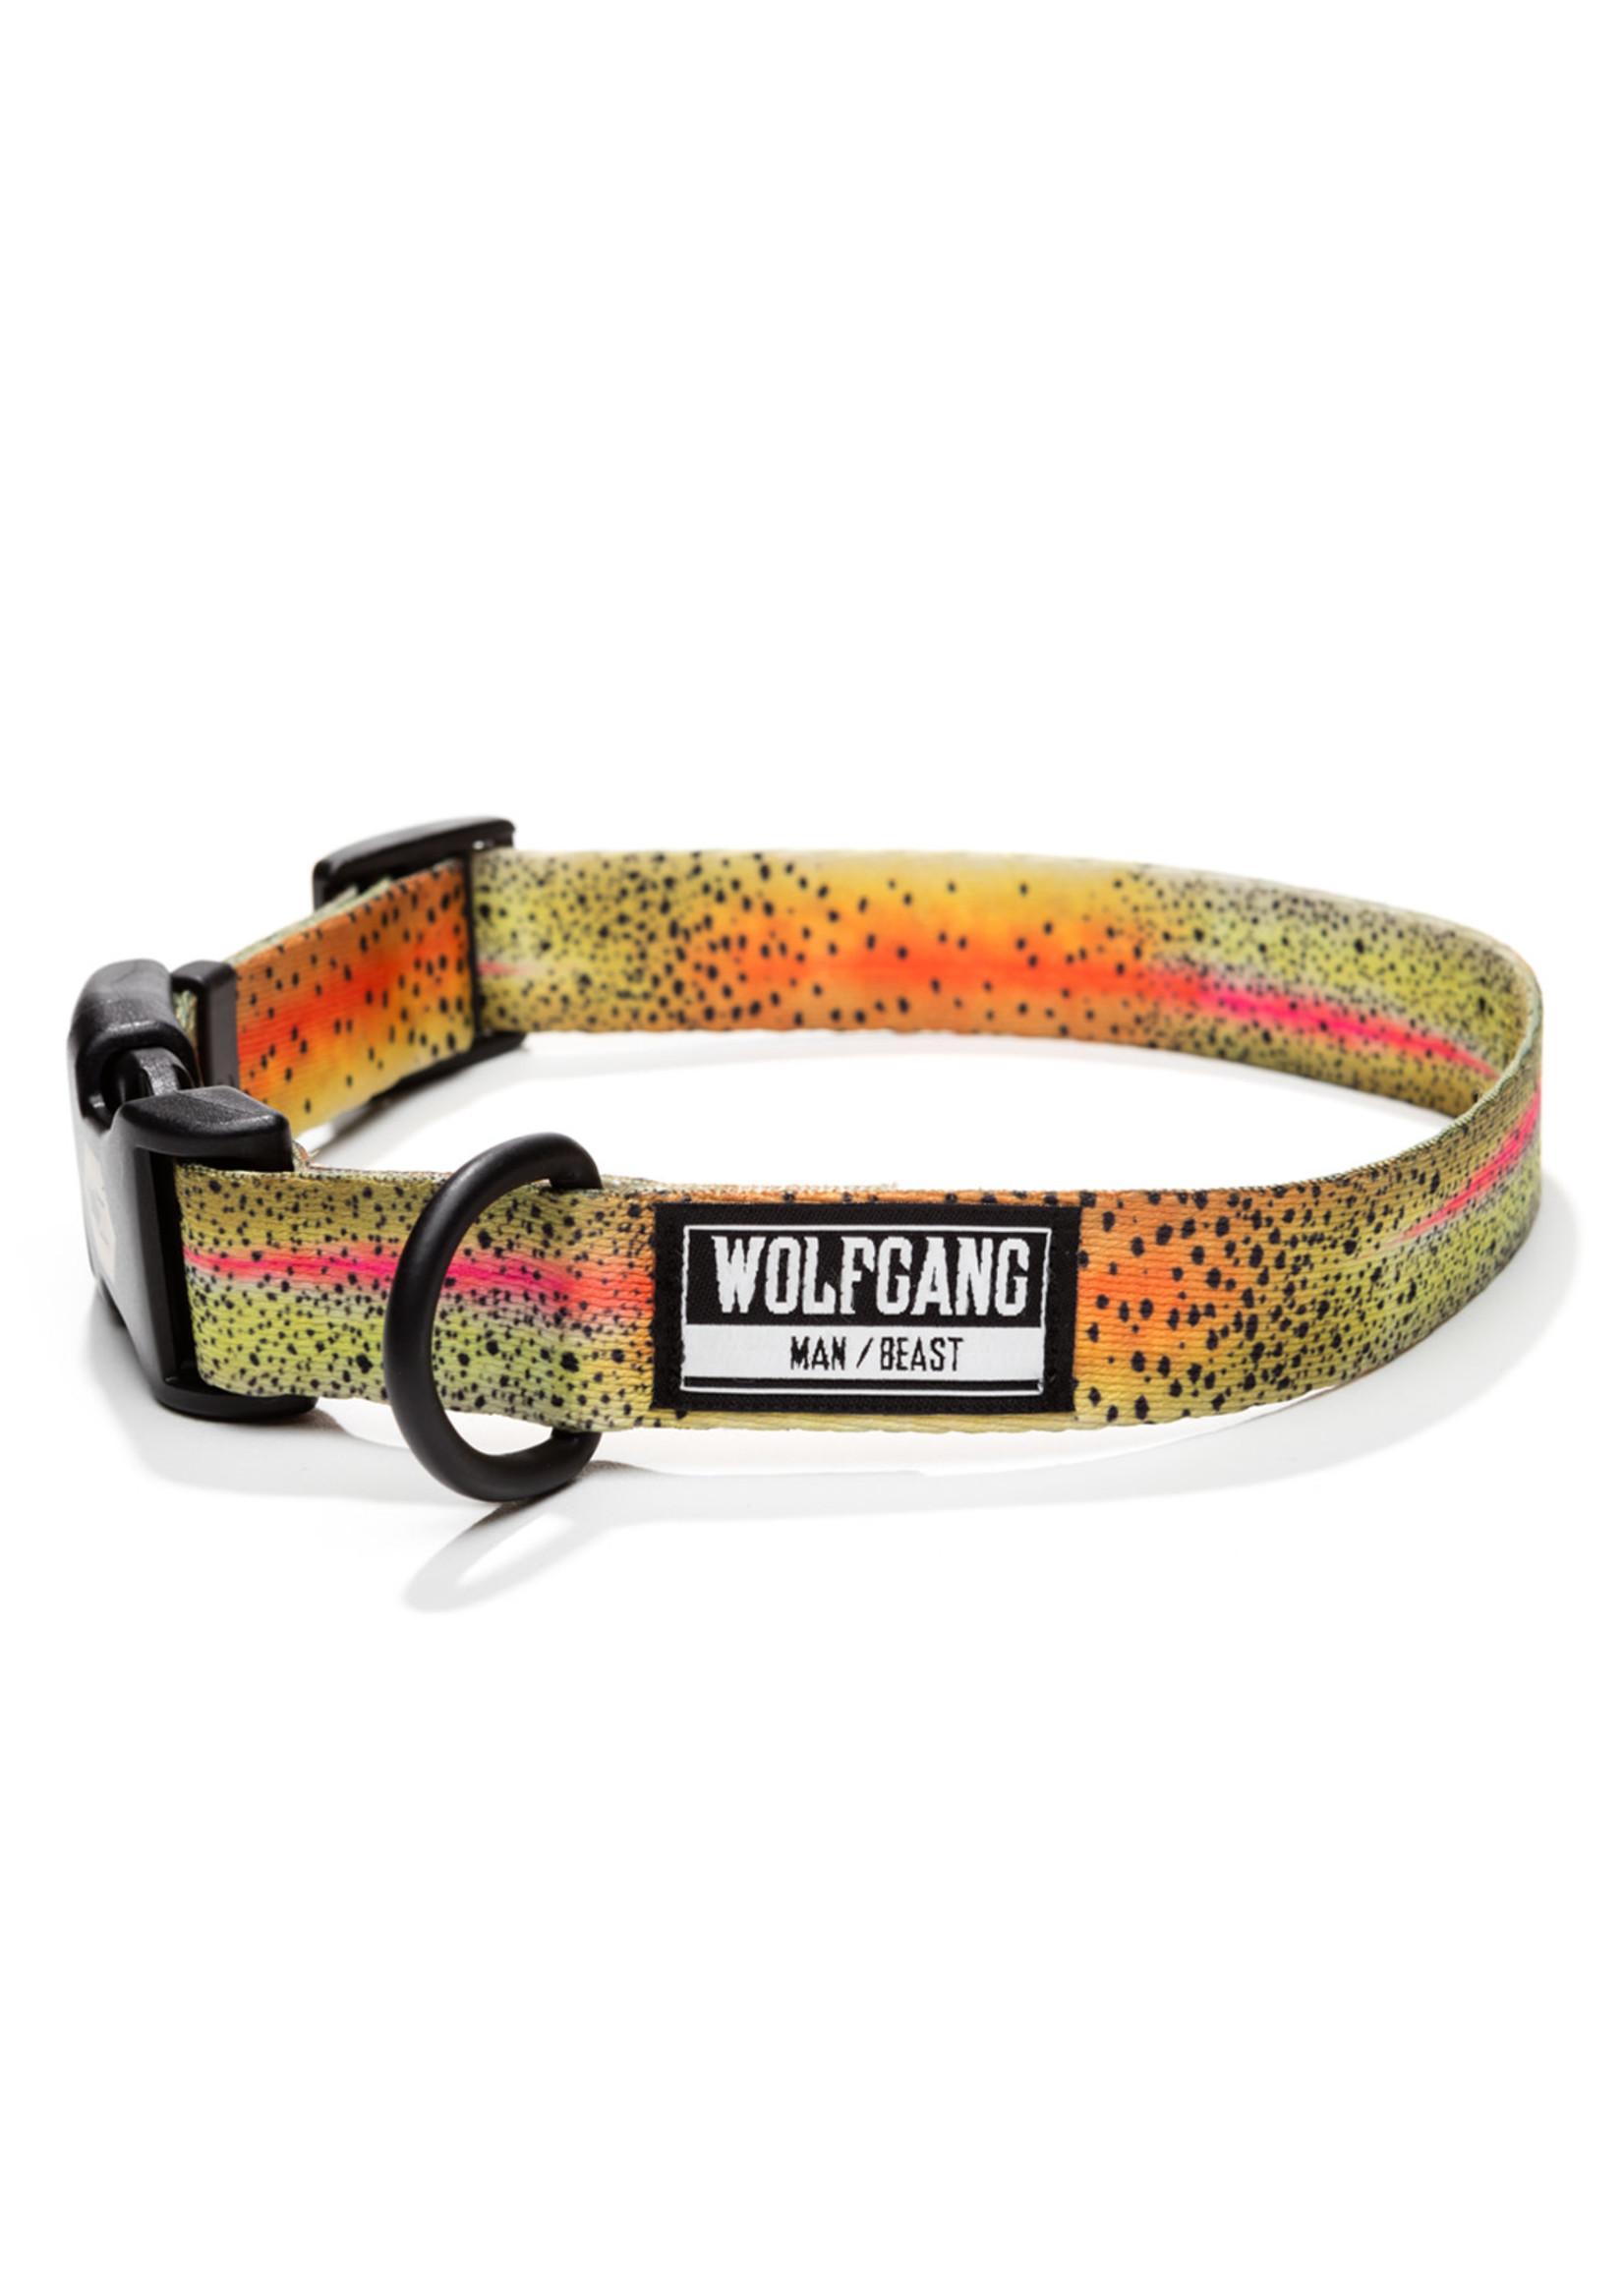 Wolfgang Man & Beast Wolfgang CutBow Collar M